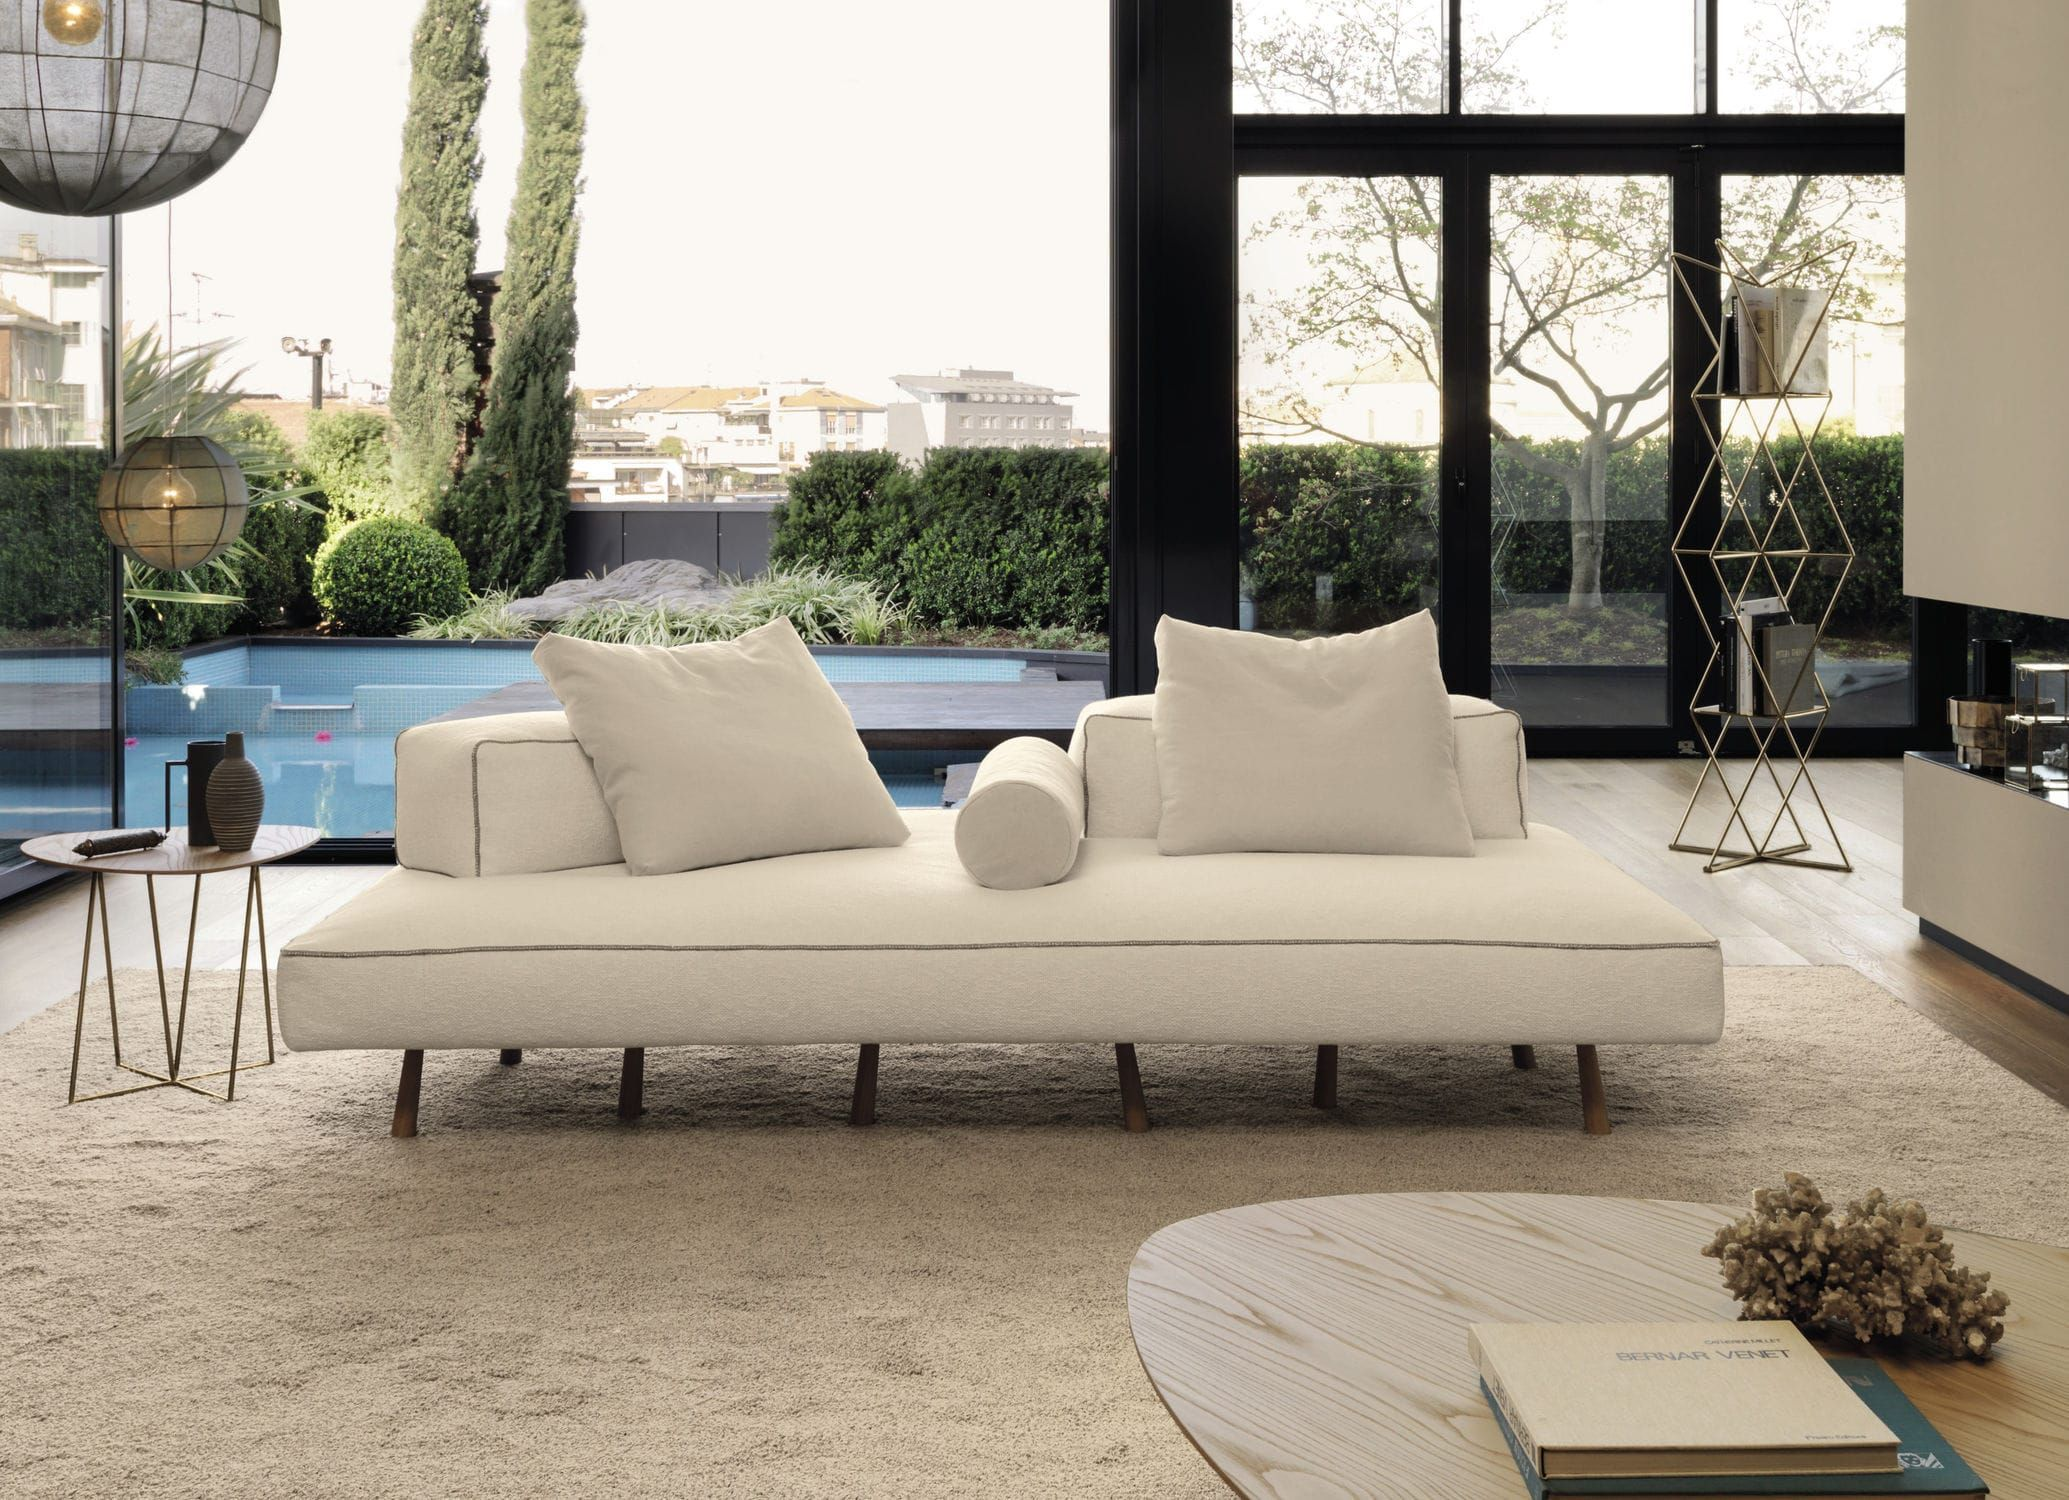 contemporary sofa / fabric / leather / wood endor désirée, Wohnzimmer dekoo